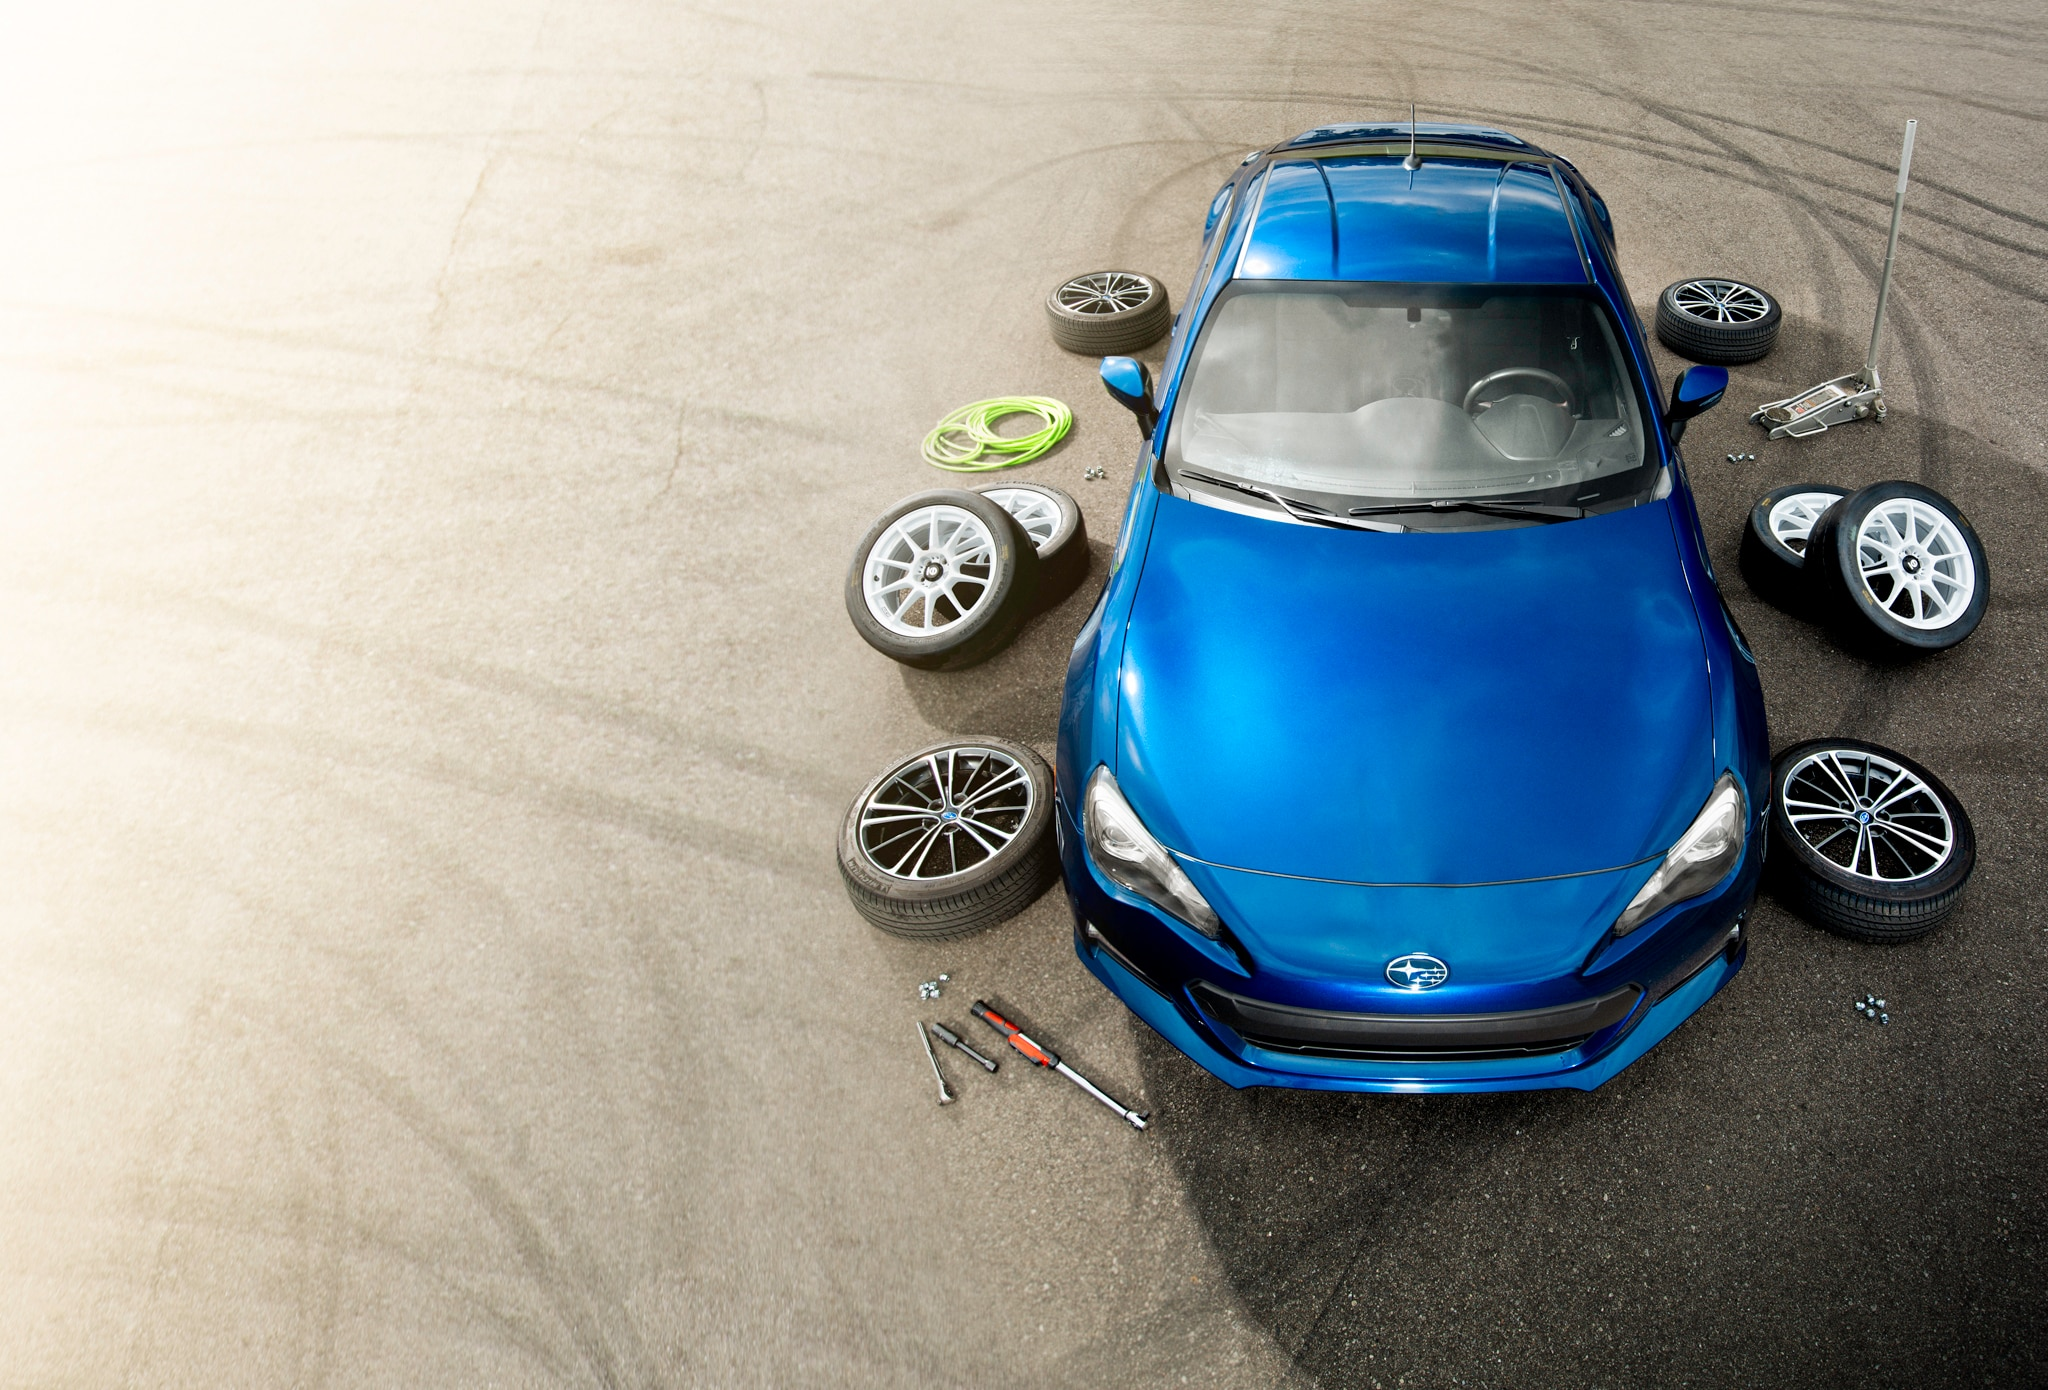 2013 Subaru Brz With Tires